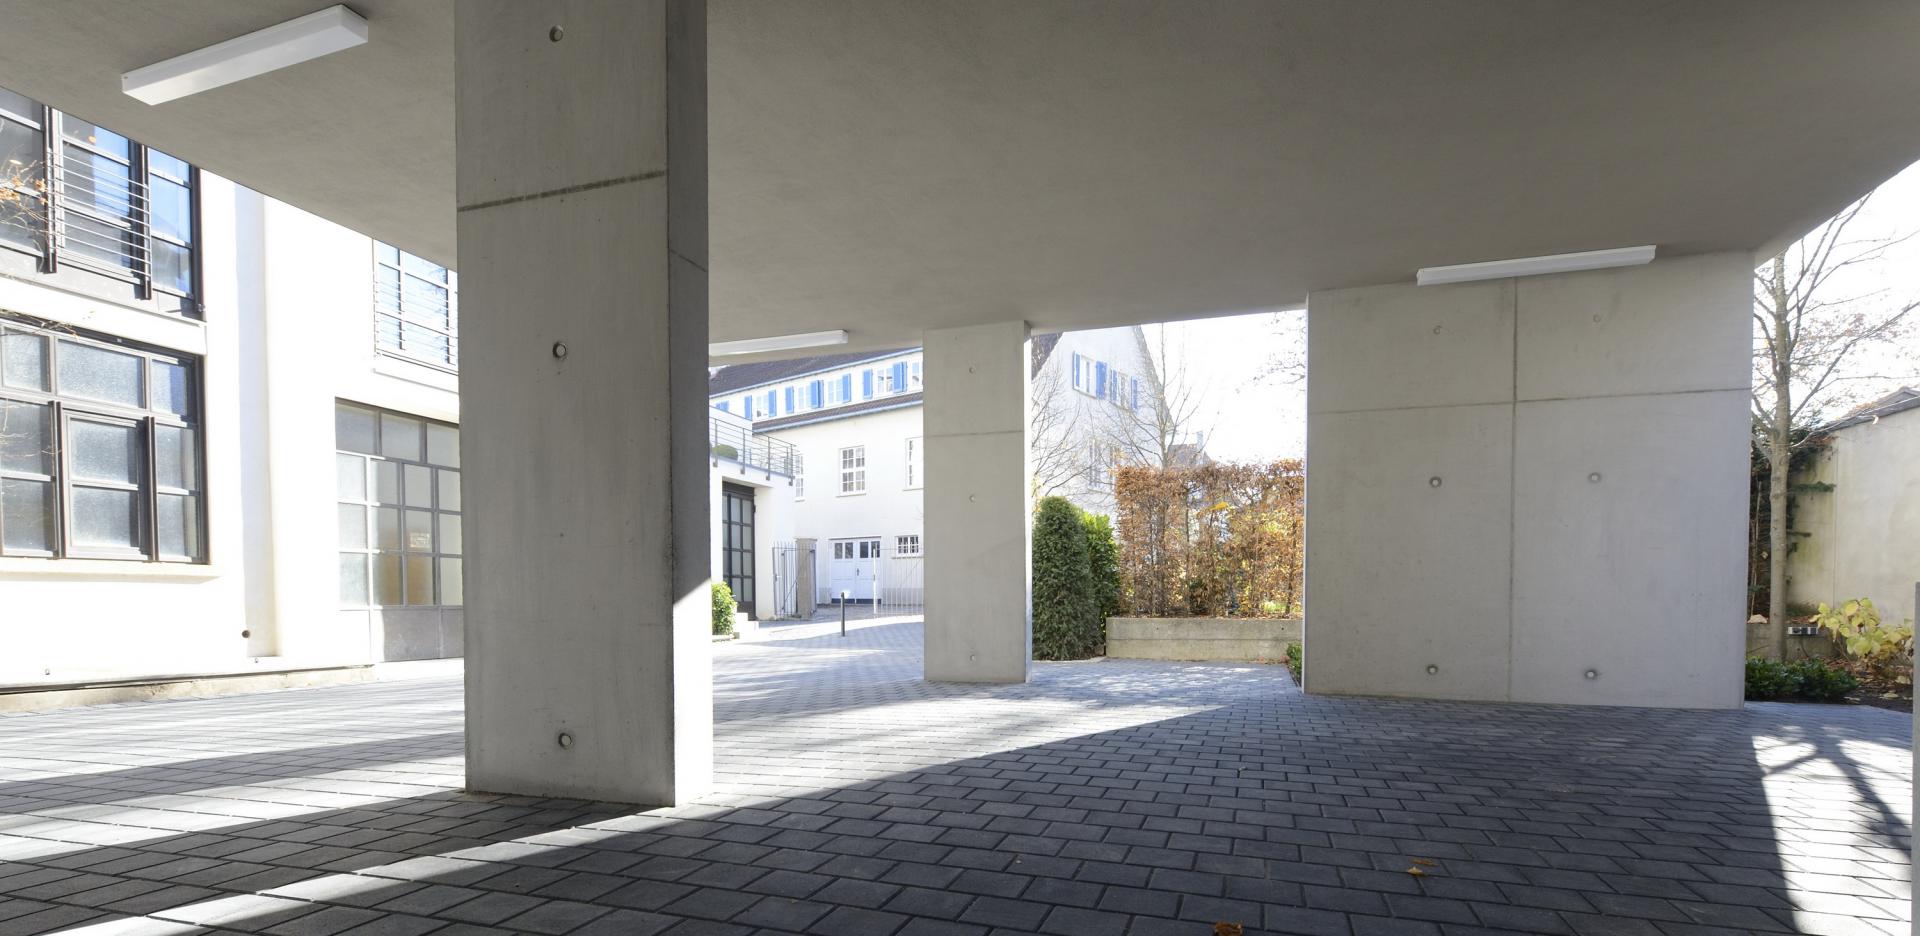 https://www.jentz-bau.de/media/pages/projekte/kmu-loft-wohn-geschaeftshaus/325179634-1610106575/slider.png